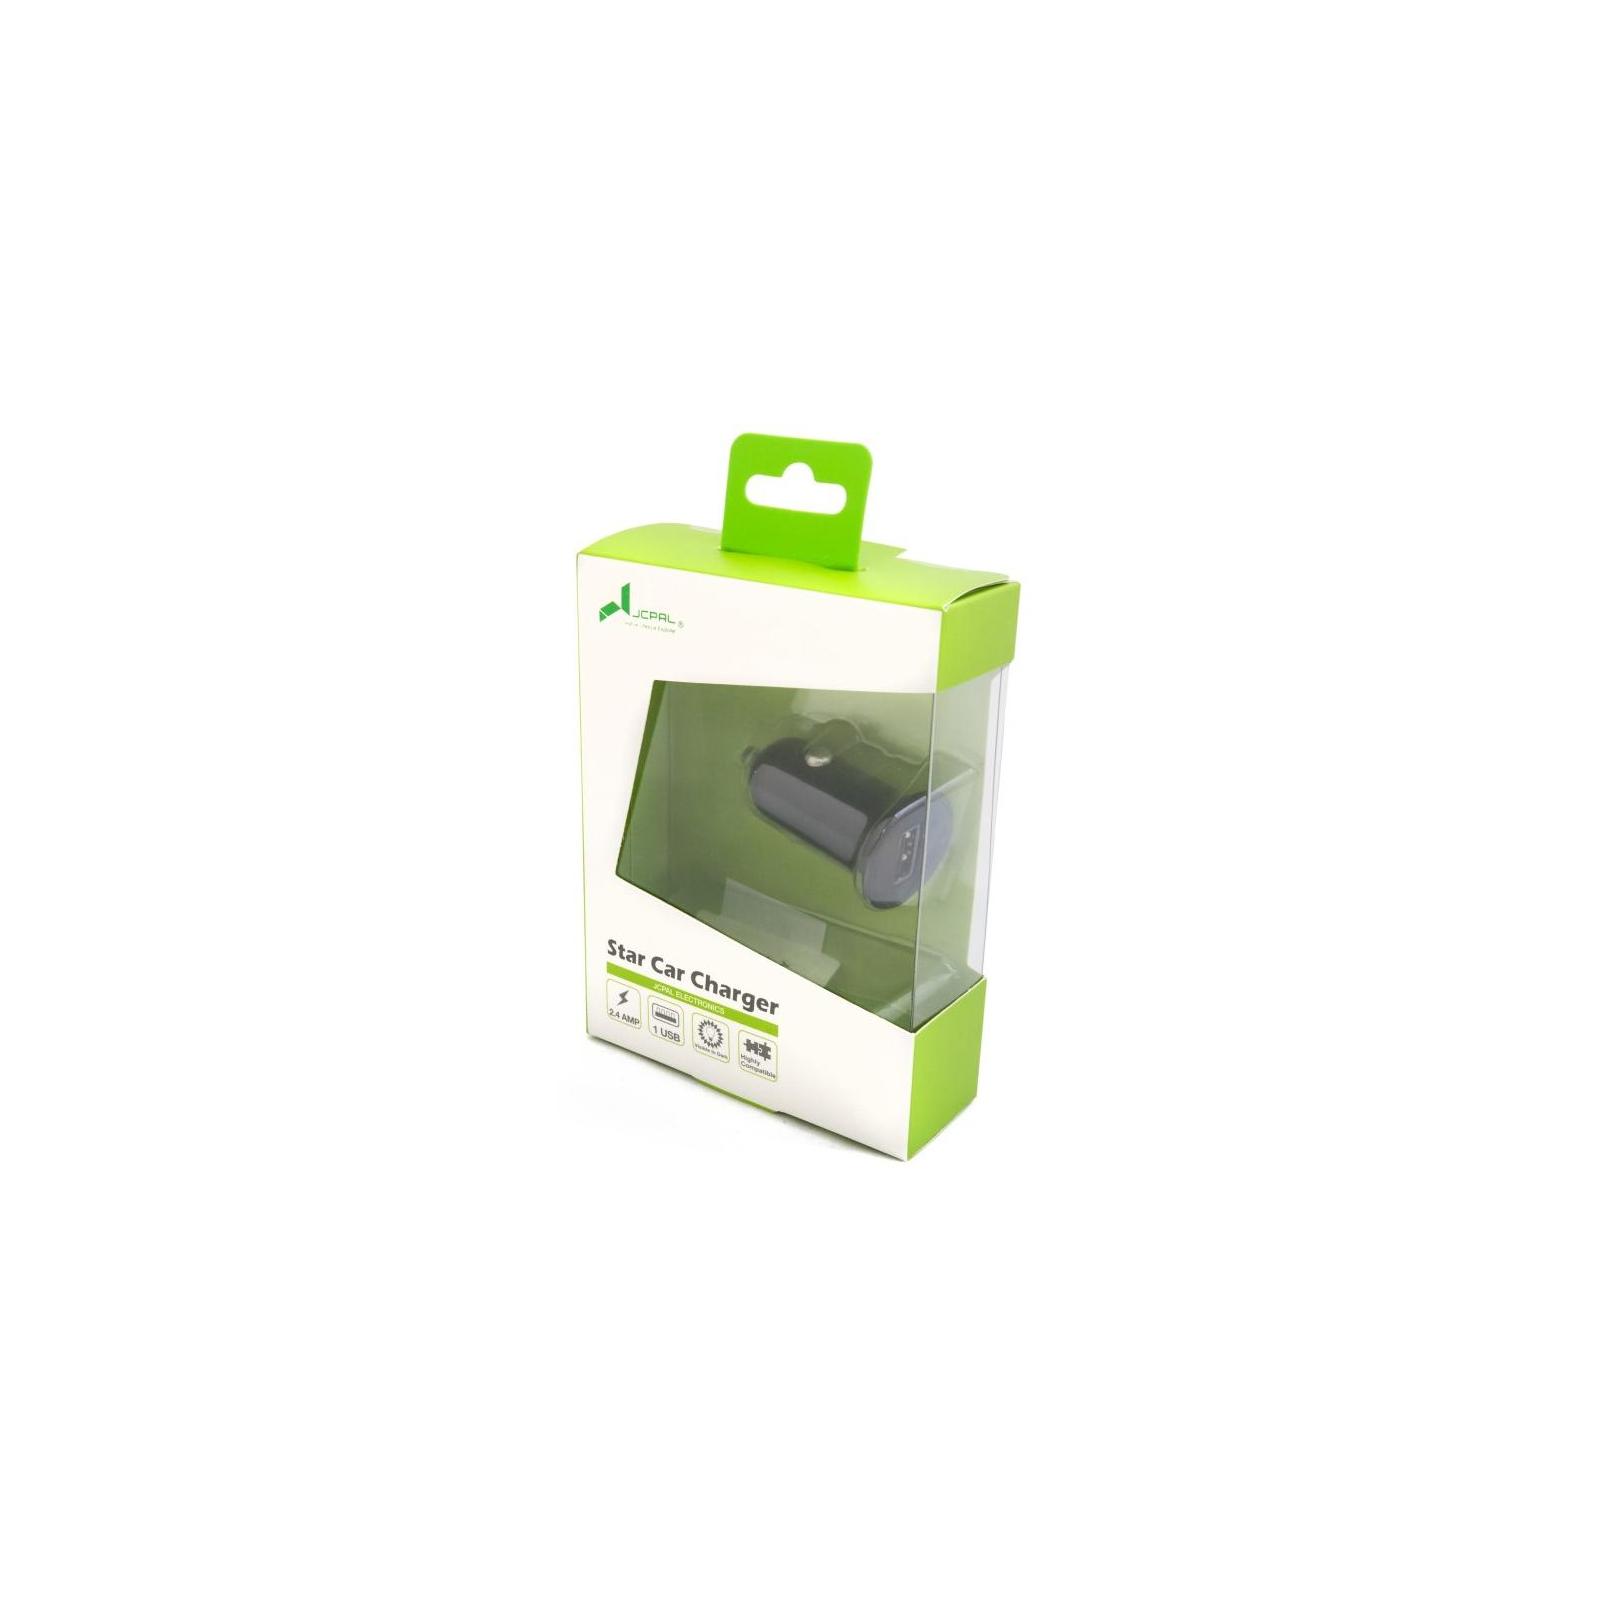 Зарядное устройство JCPAL Star 1*USB, 2.4A (JCP6005) изображение 6